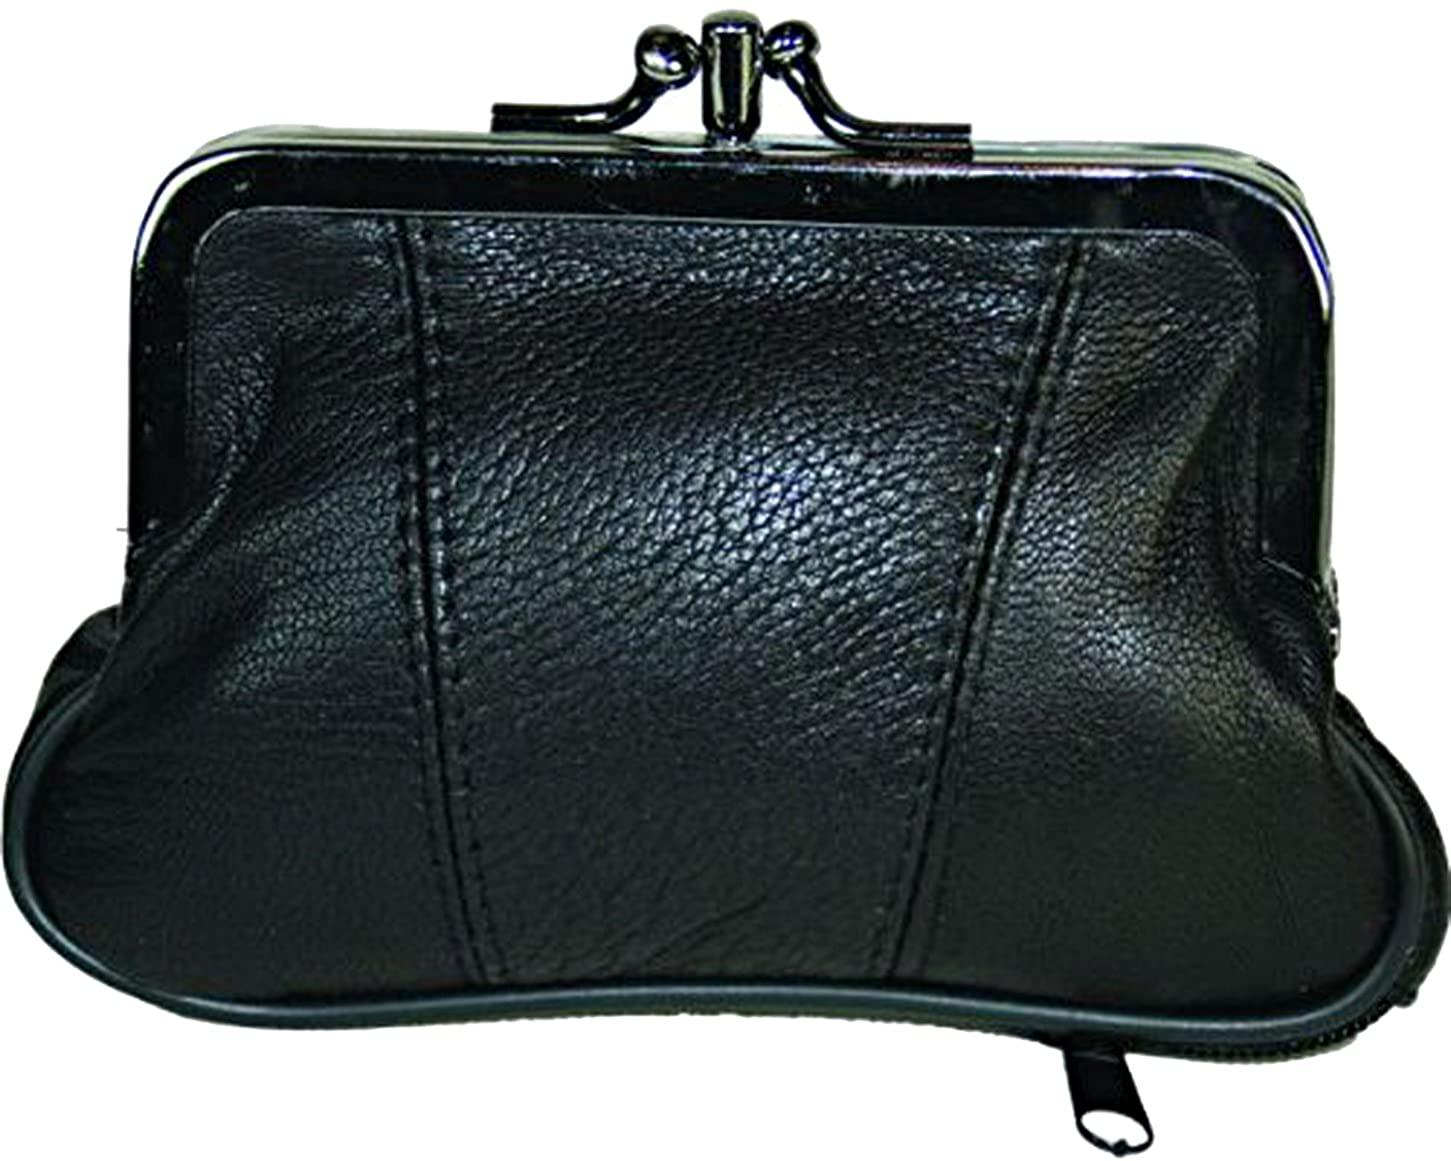 Leather Change Purse Black Y062